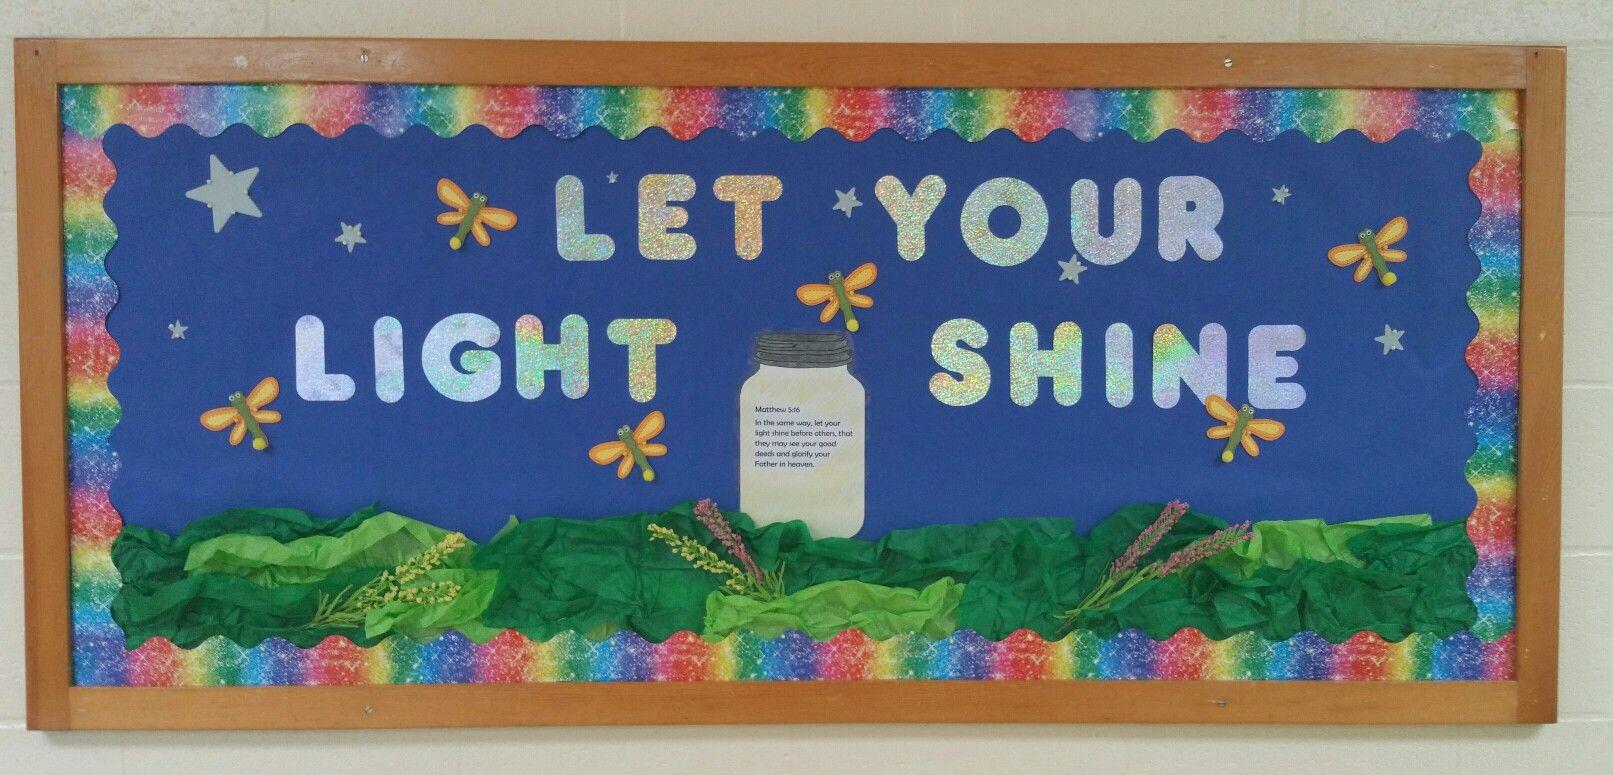 Sunday School Bulletin Board Let Your Light Shine Decorations Themes Classroom